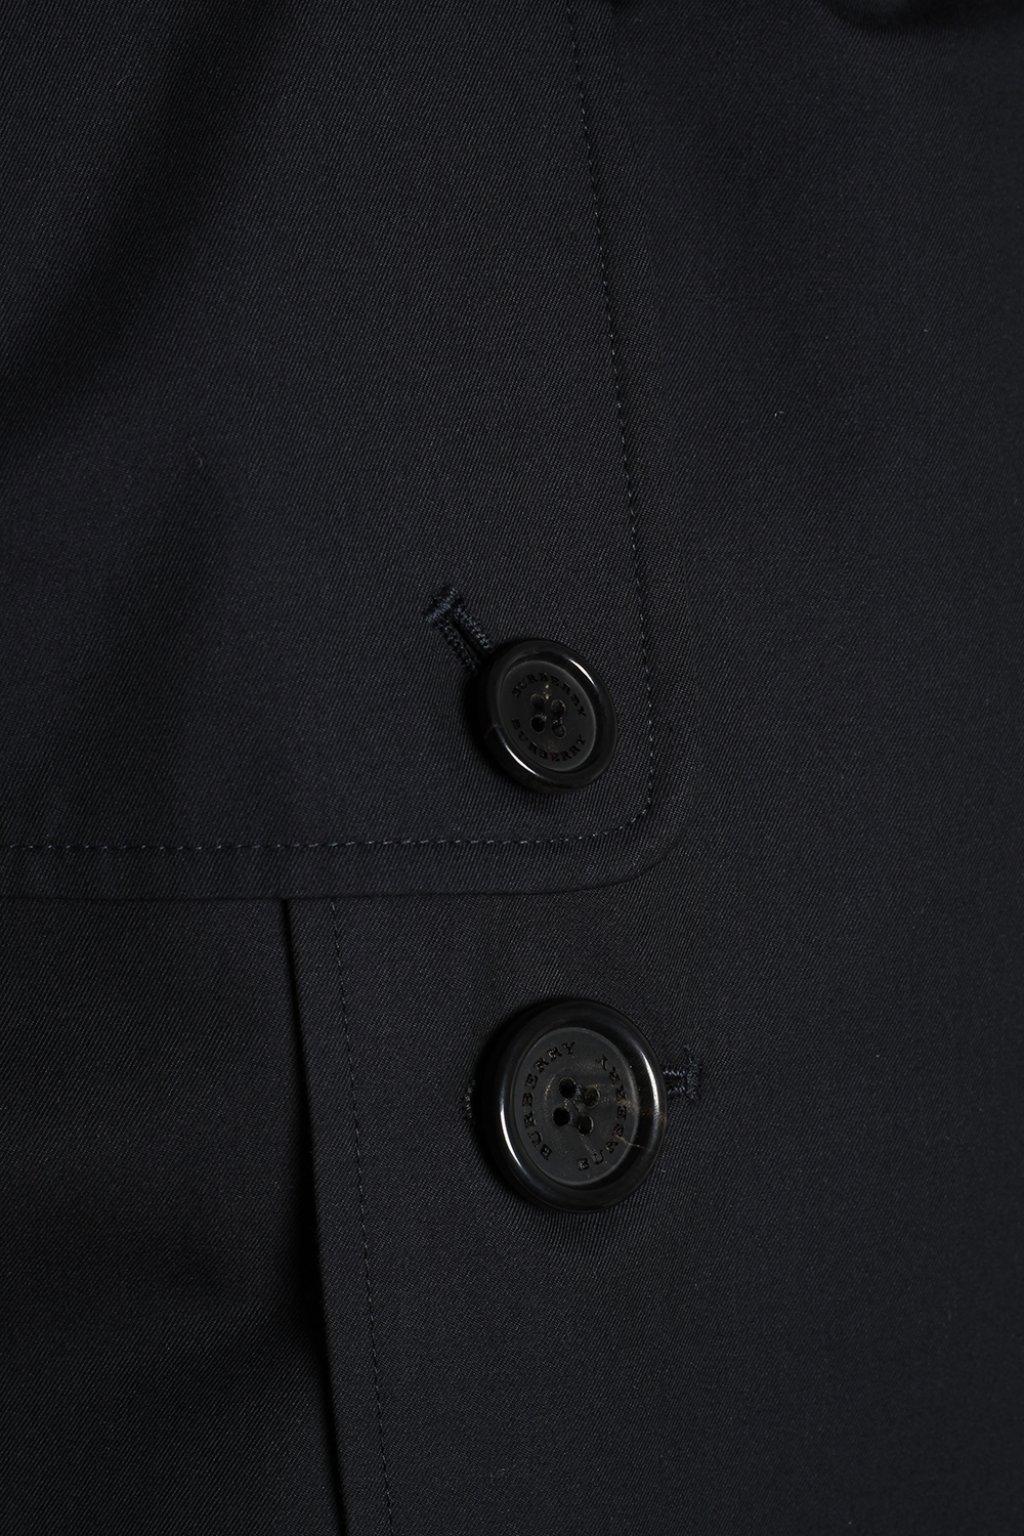 Burberry 'The Kensington' trench coat